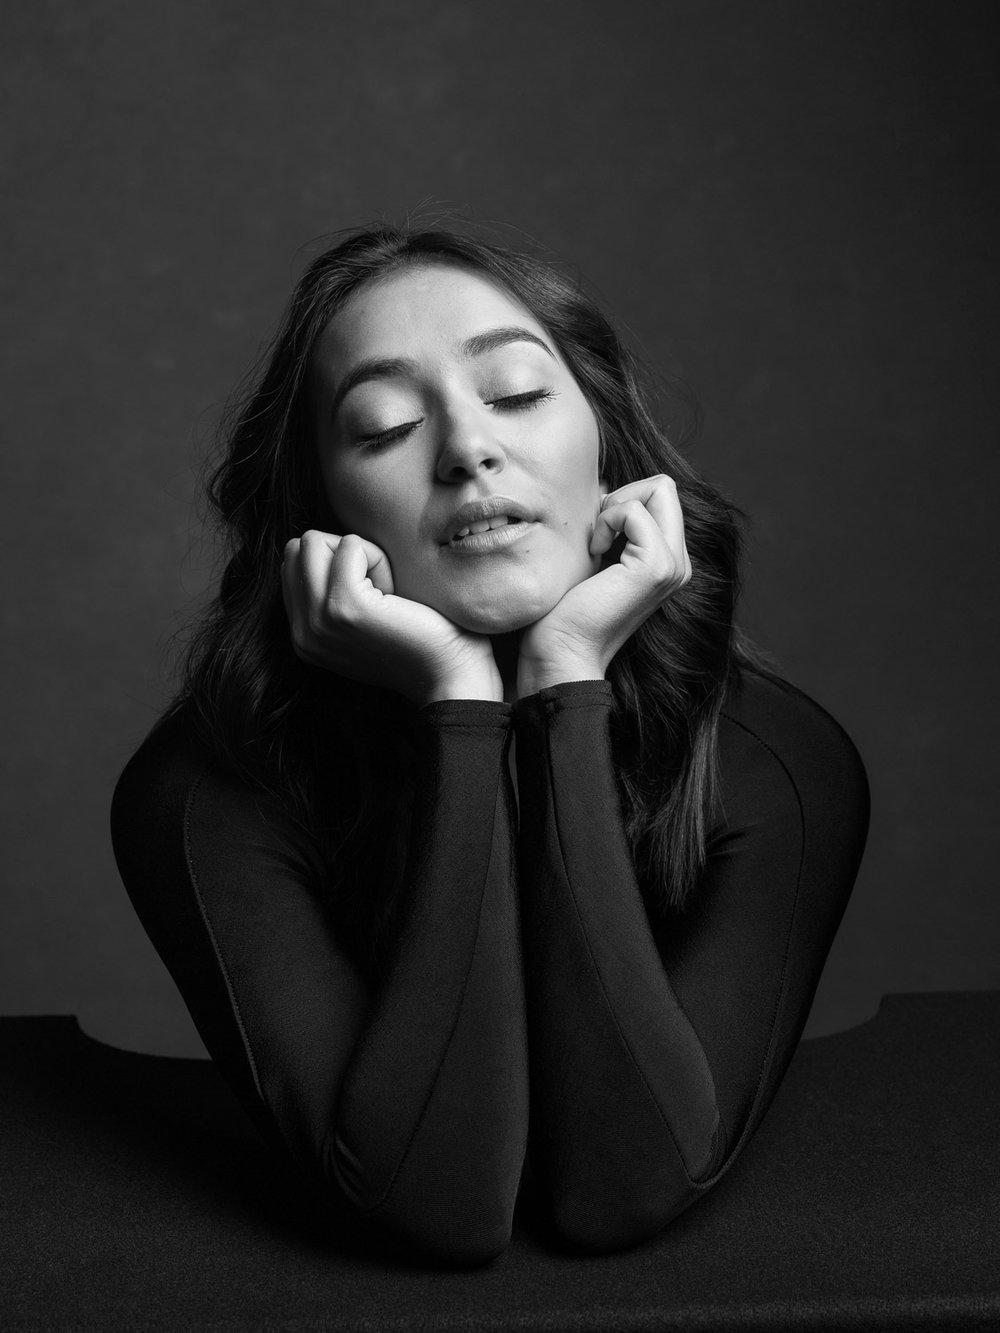 Sofia Contreras-Paredes - Textile Manipulator / Creative Director of MEÜS